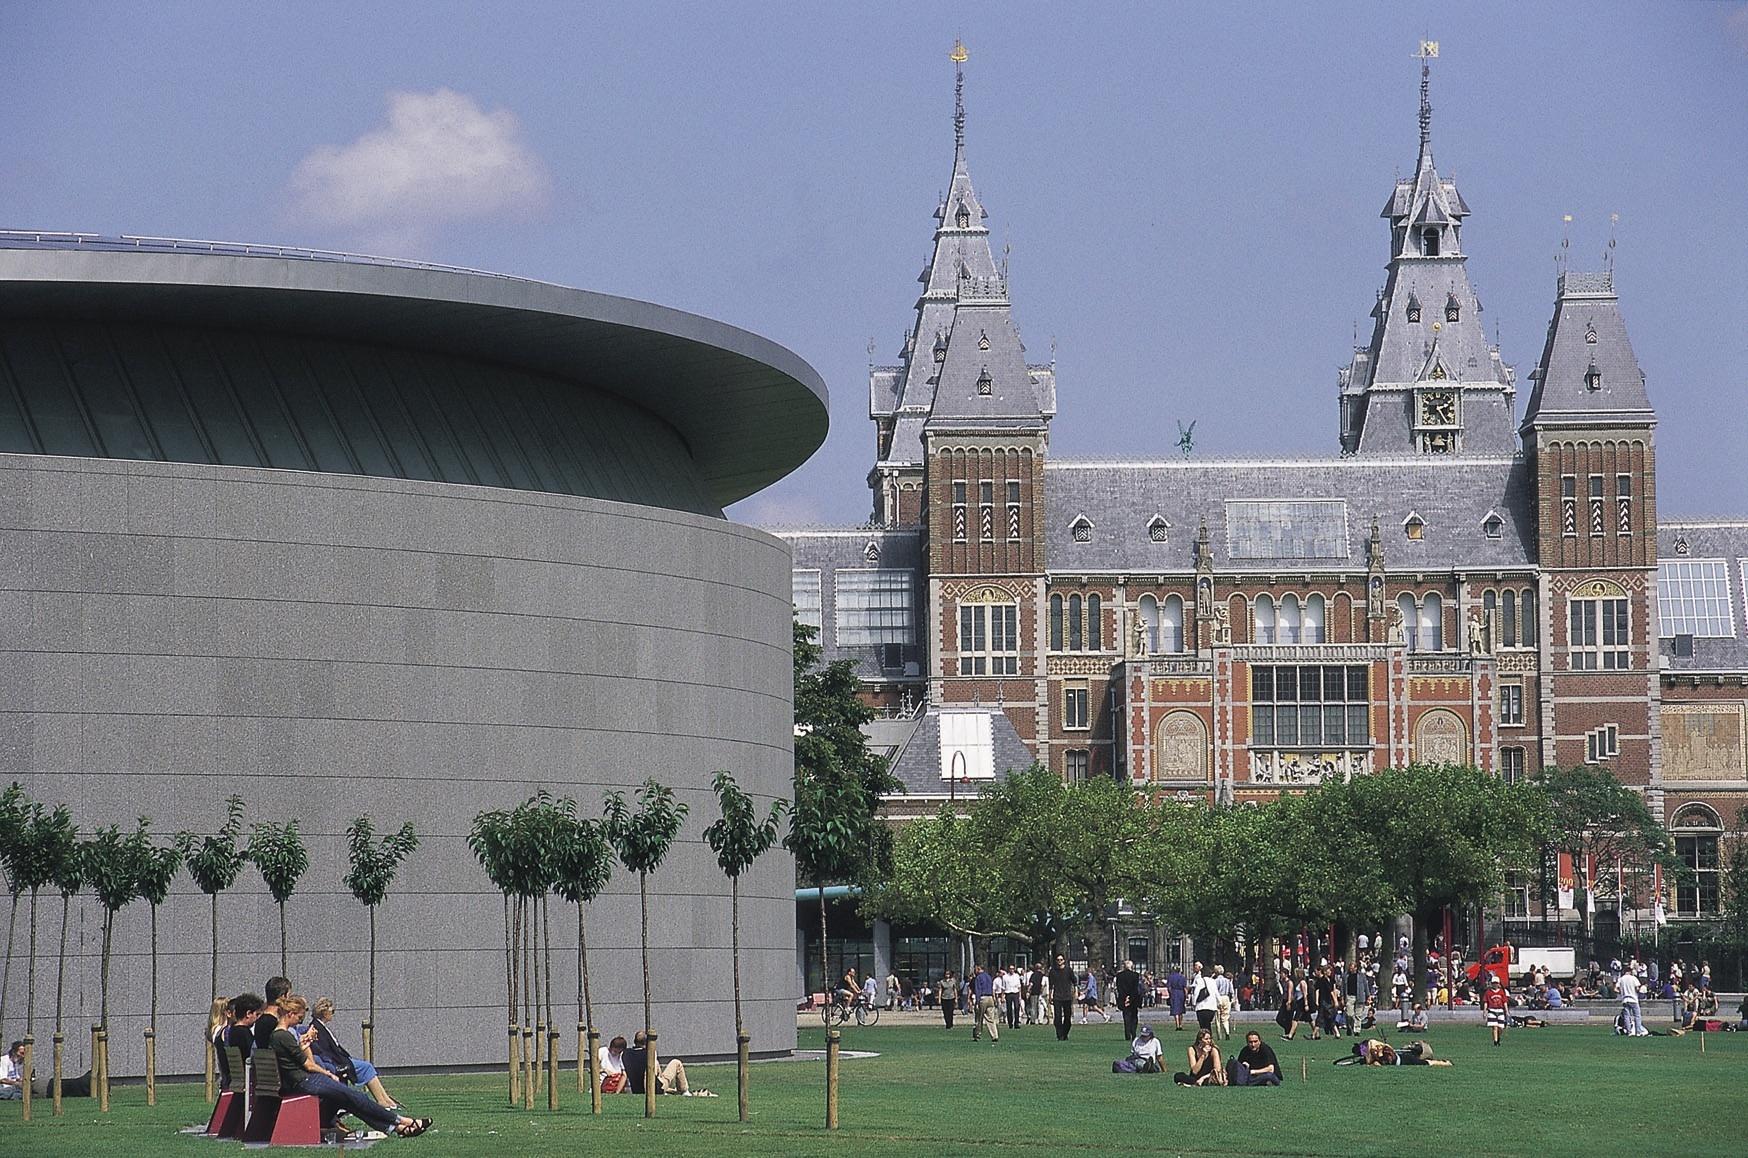 2011-06-03-AmsterdamVanGoghleftRijksmuseumright2.jpg